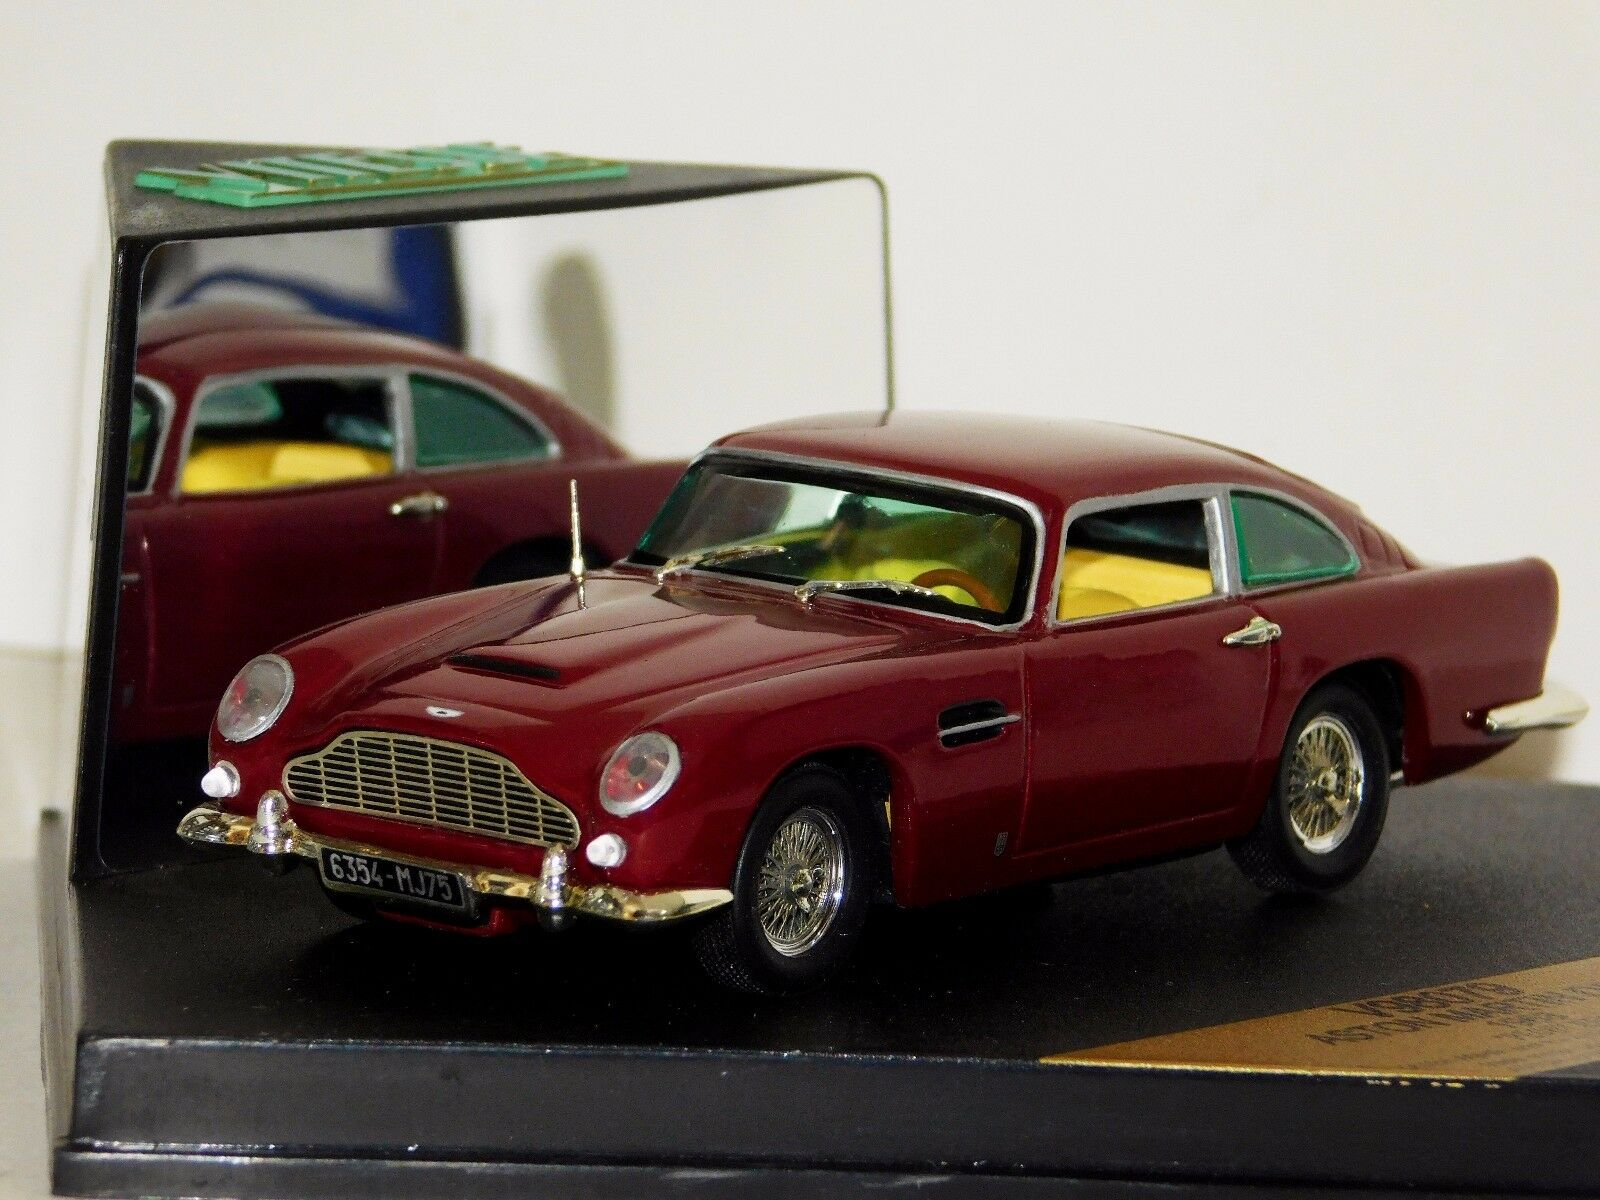 Aston Martin Db5 For Sale Ebay >> Aston Martin Db5 1963 Peony Red Vitesse V98079 1 43 Mint Ebay